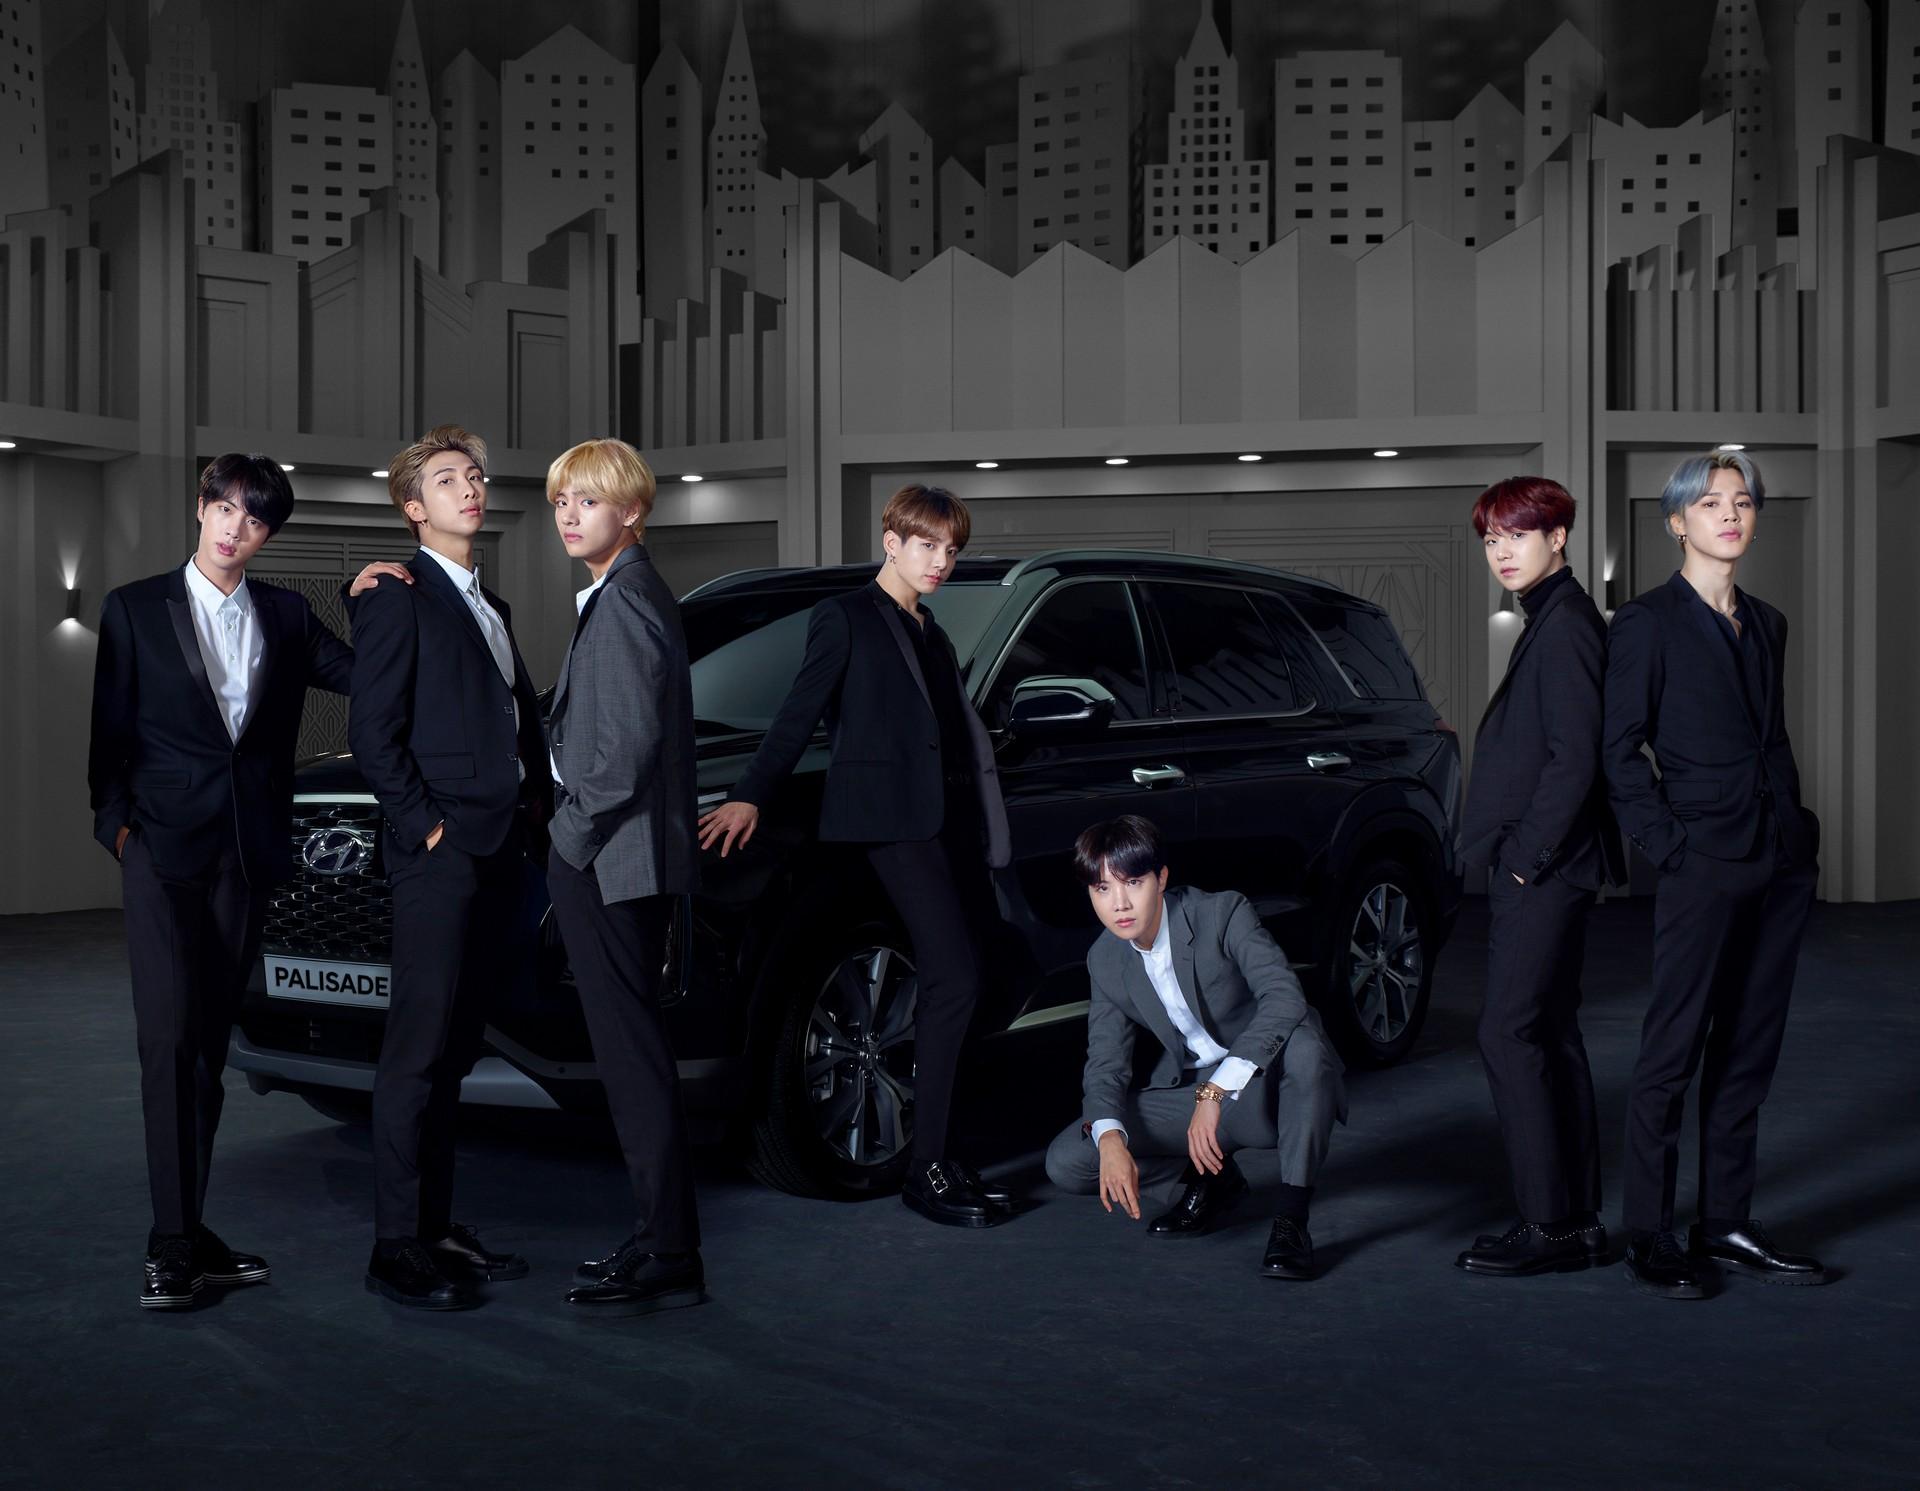 K-Pop Band Chosen To Endorse 2020 Hyundai Palisade ...